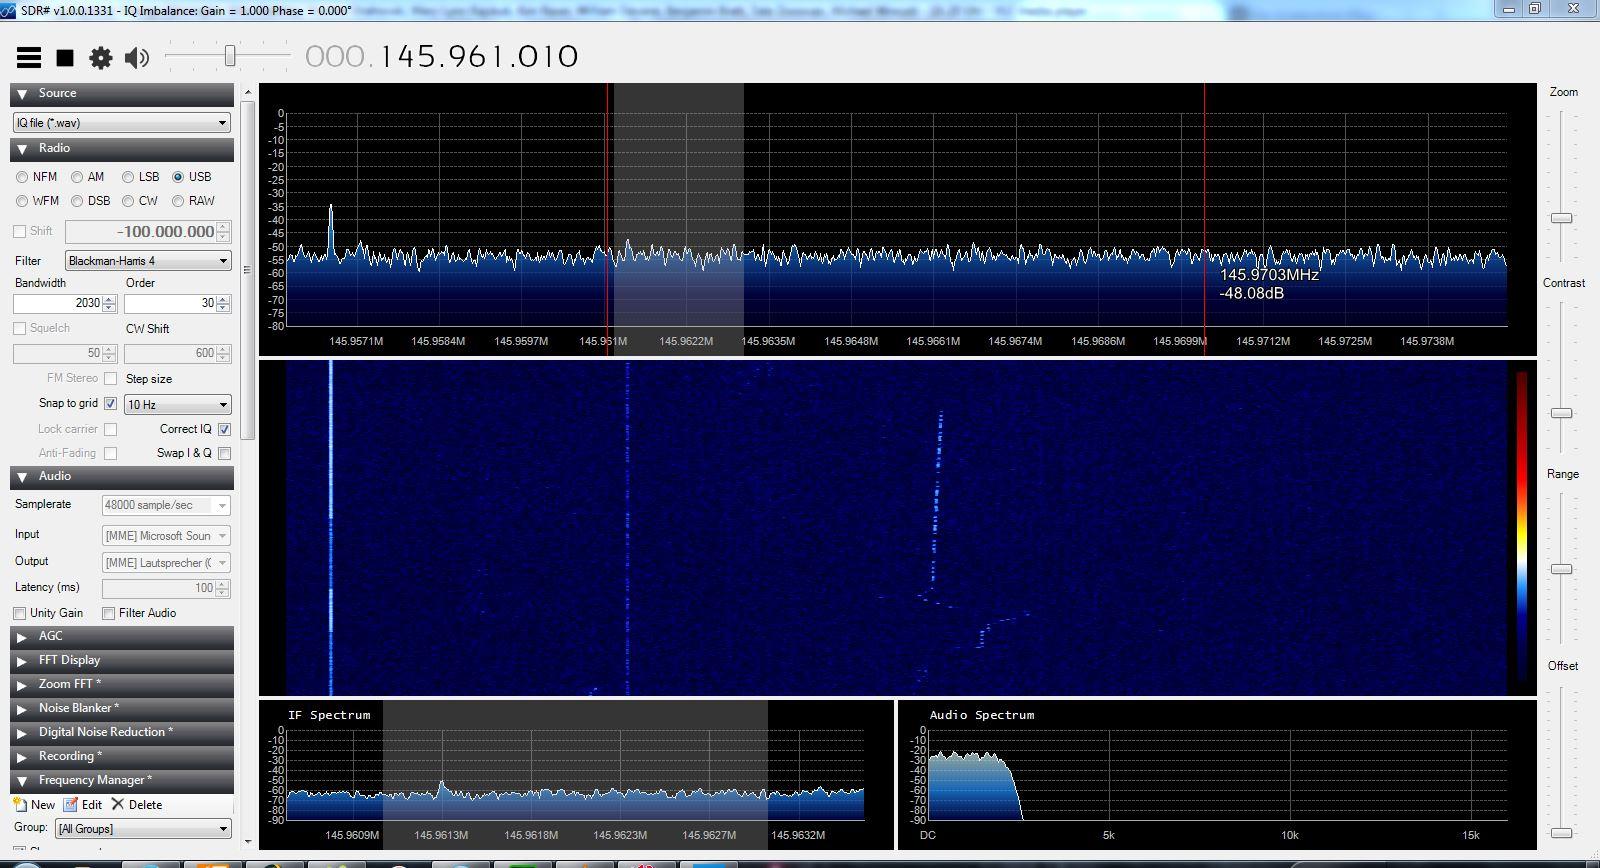 CW Signal über den Lineartransponder von Funcube-1 gesendet